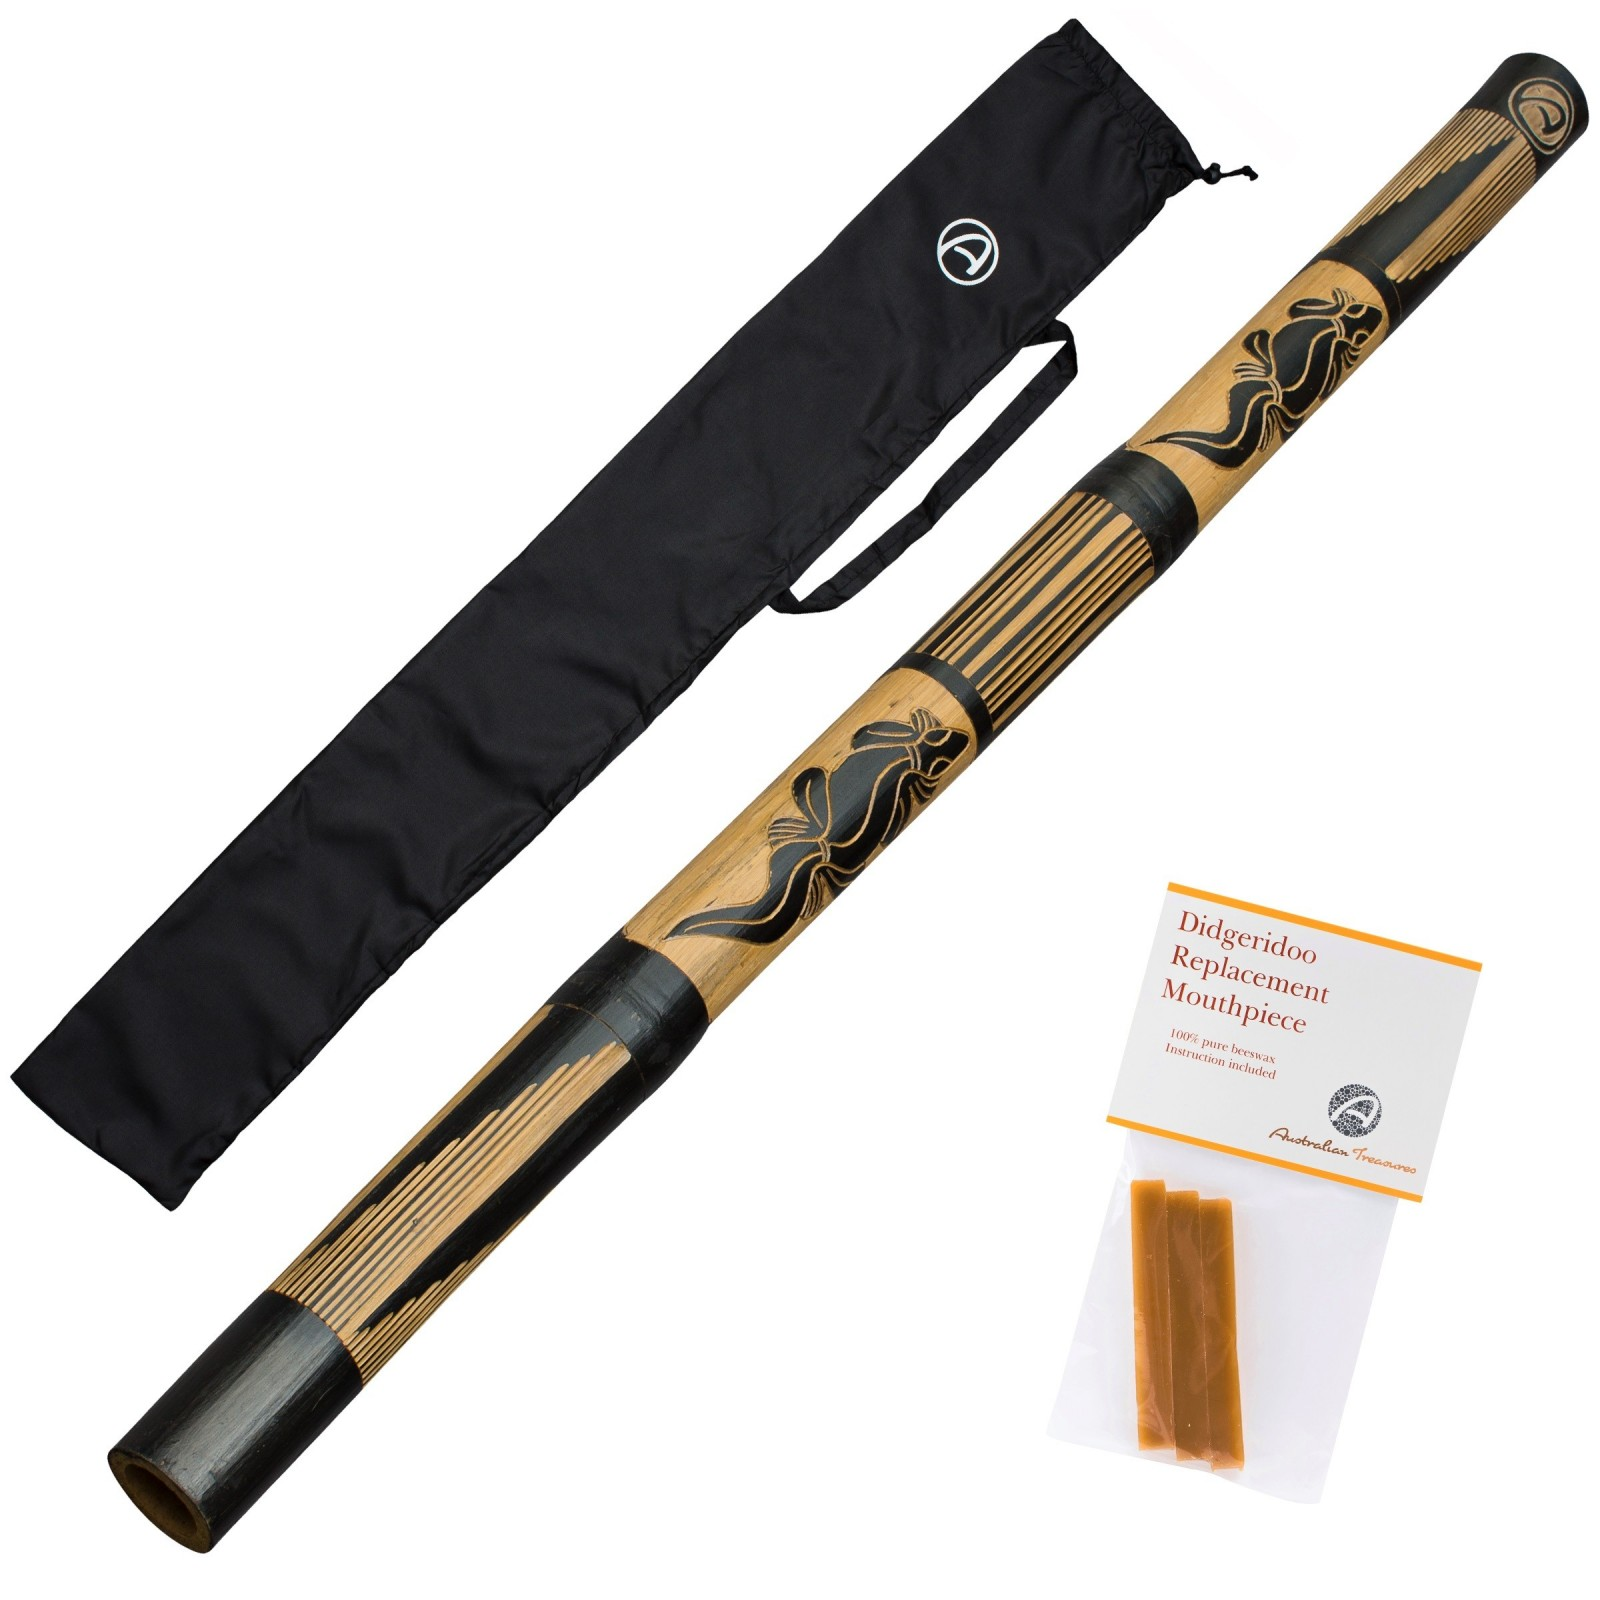 DIDGERIDOO CARVED: didgeridoo bambu con cera d'api a 3 strisce e sacchetto didgeridoo in nylon